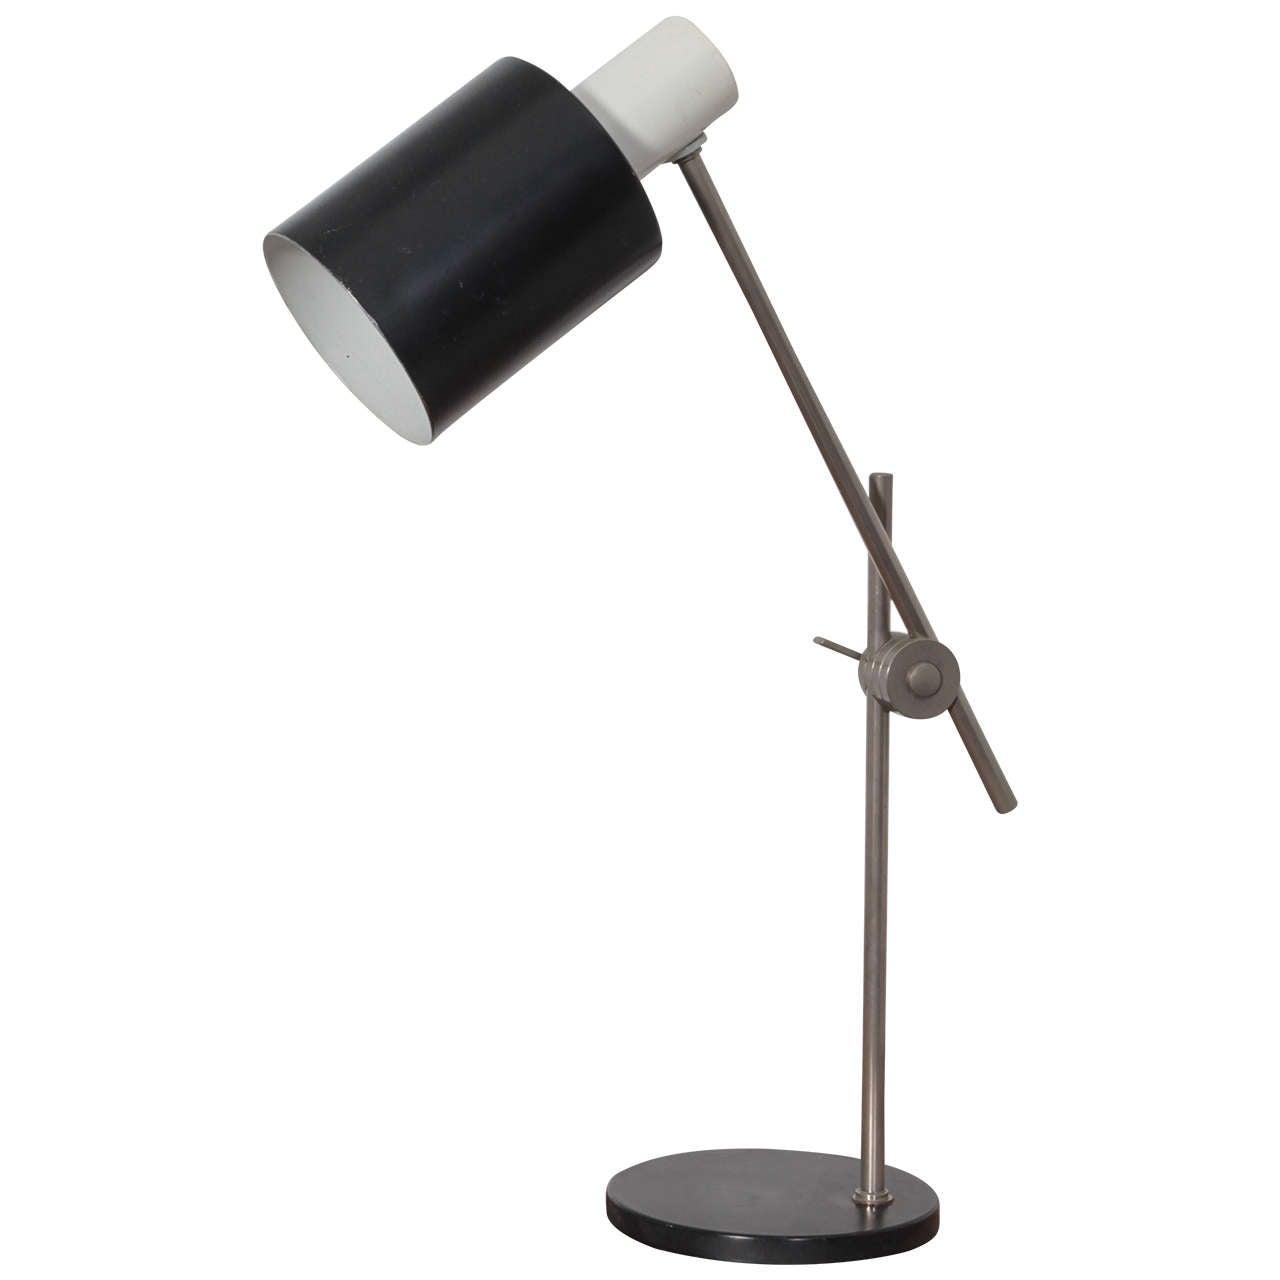 Minimalist Desk Lamp By Hala Zeist Holland For